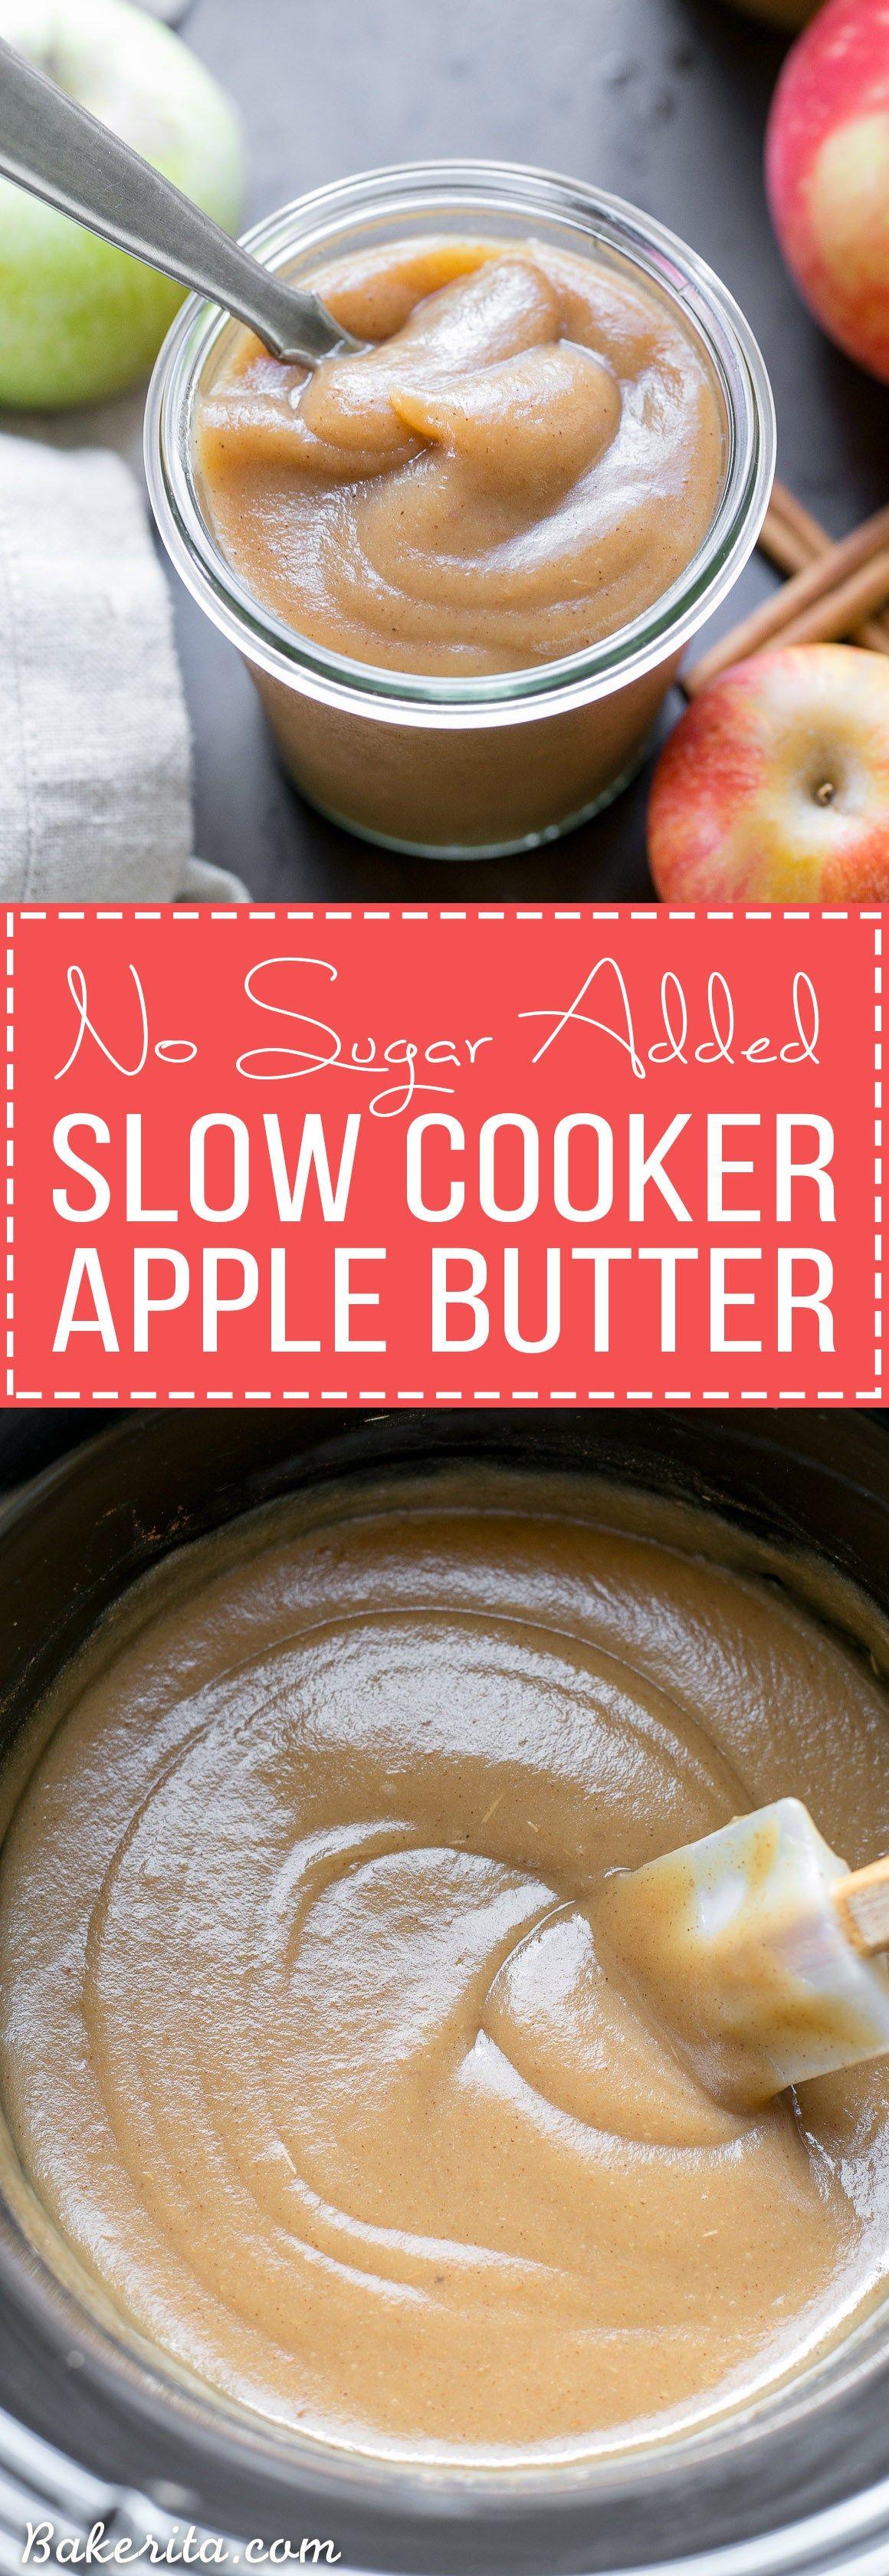 Slow Cooker Apple Butter Recipe Slow cooker apples